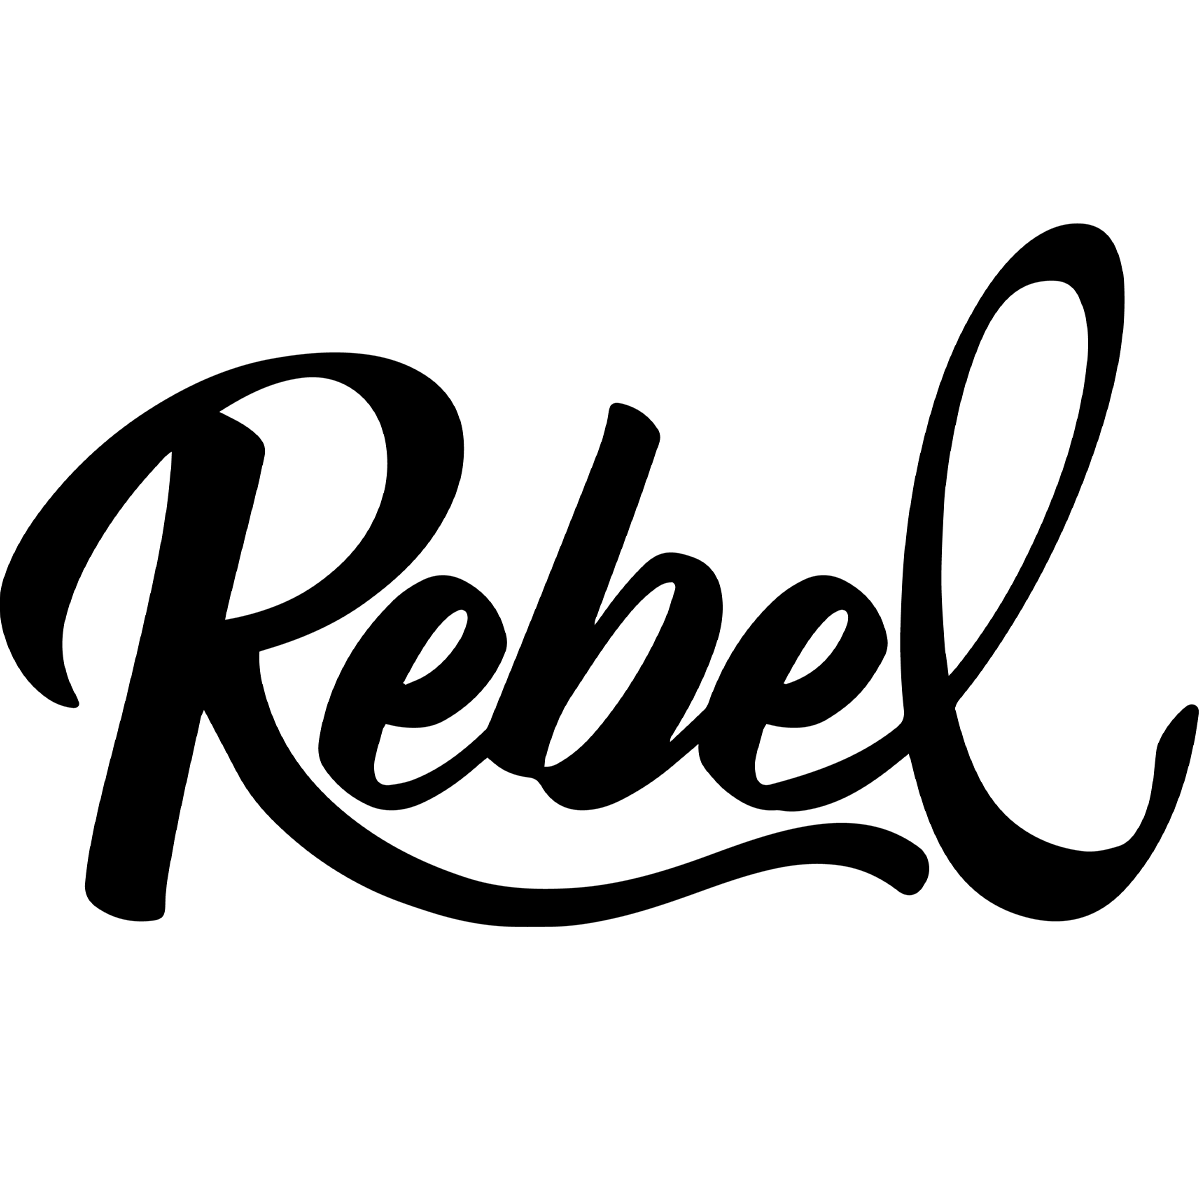 Rebel Creamery logo